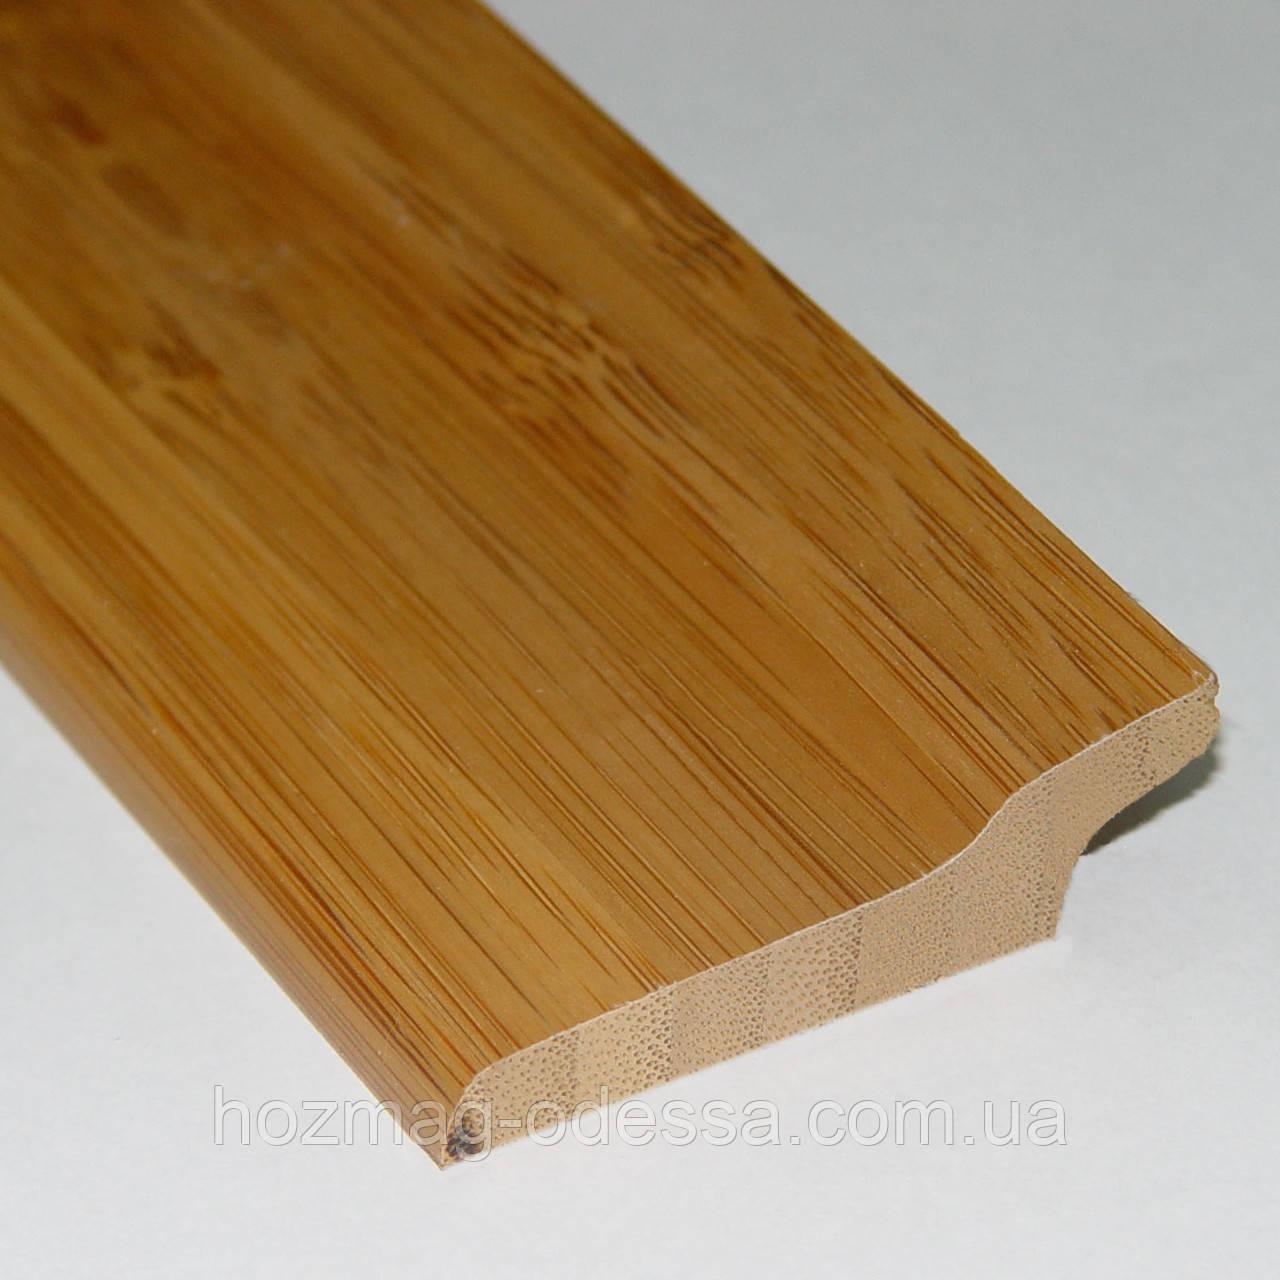 Плинтус бамбуковый темный